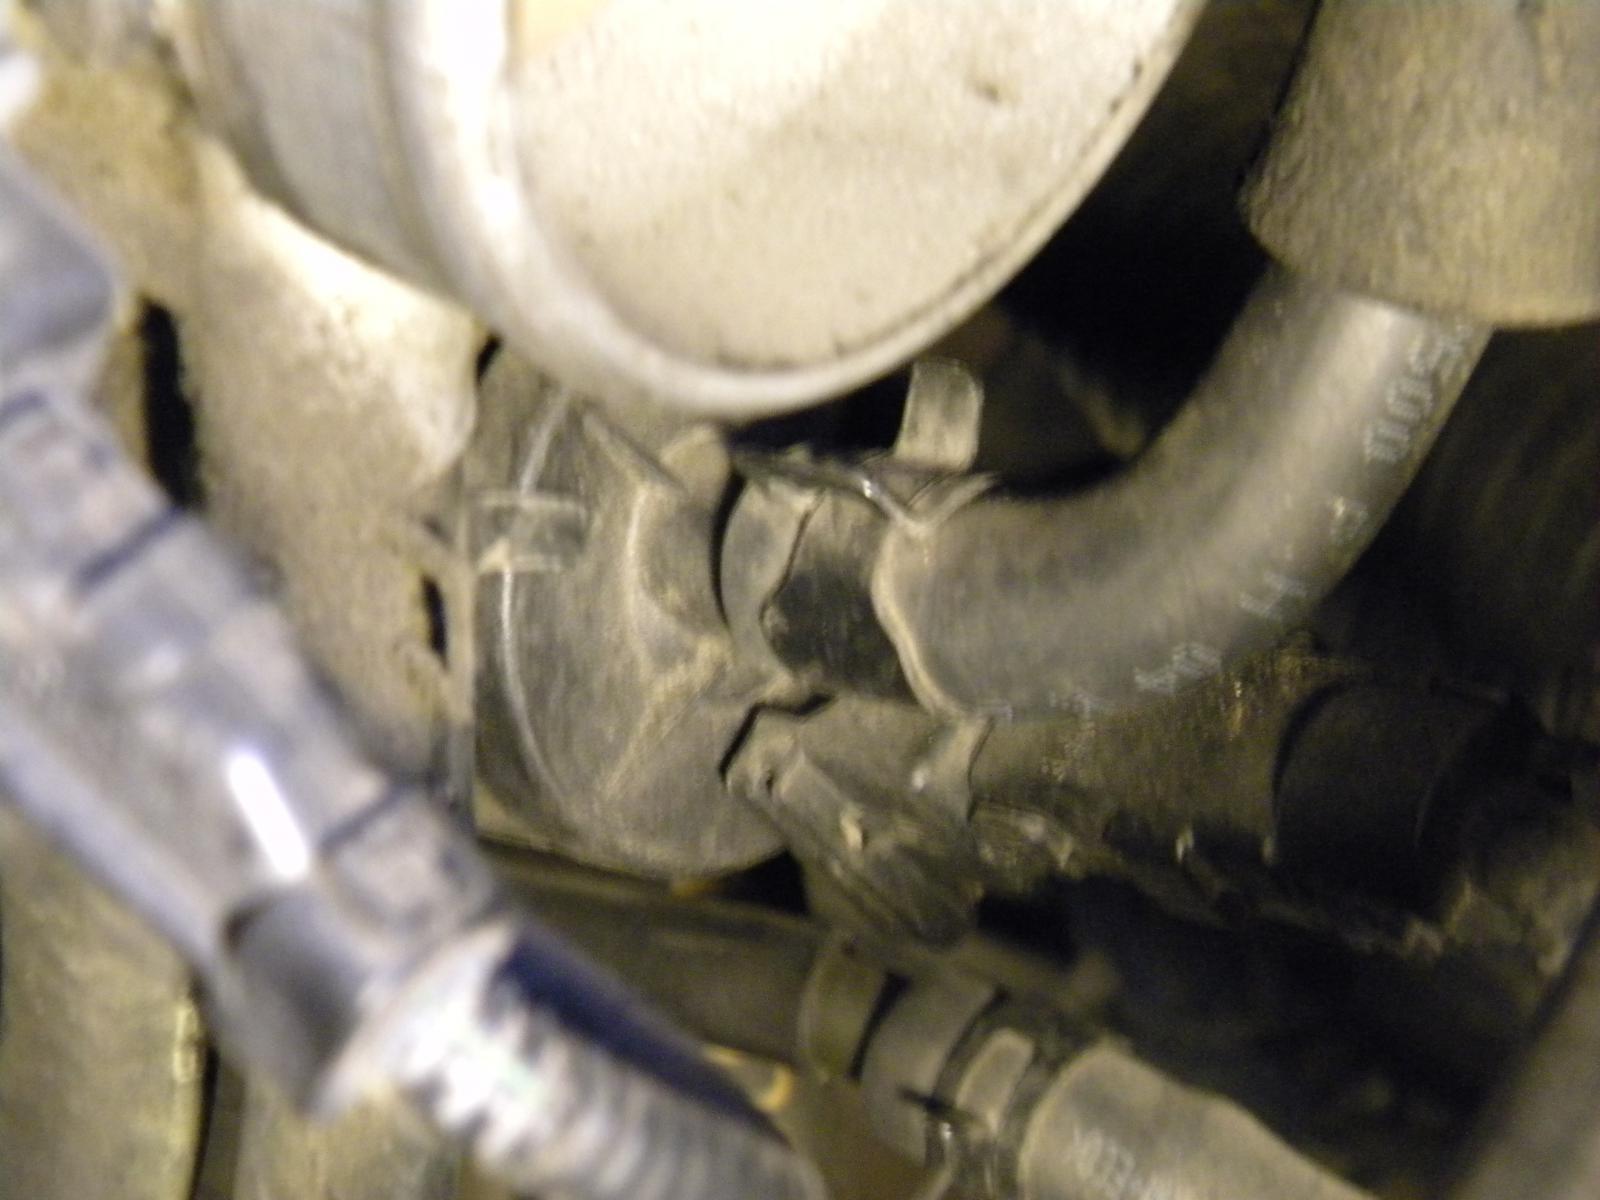 hight resolution of purge control solenoid valve pcsv purge valve just below